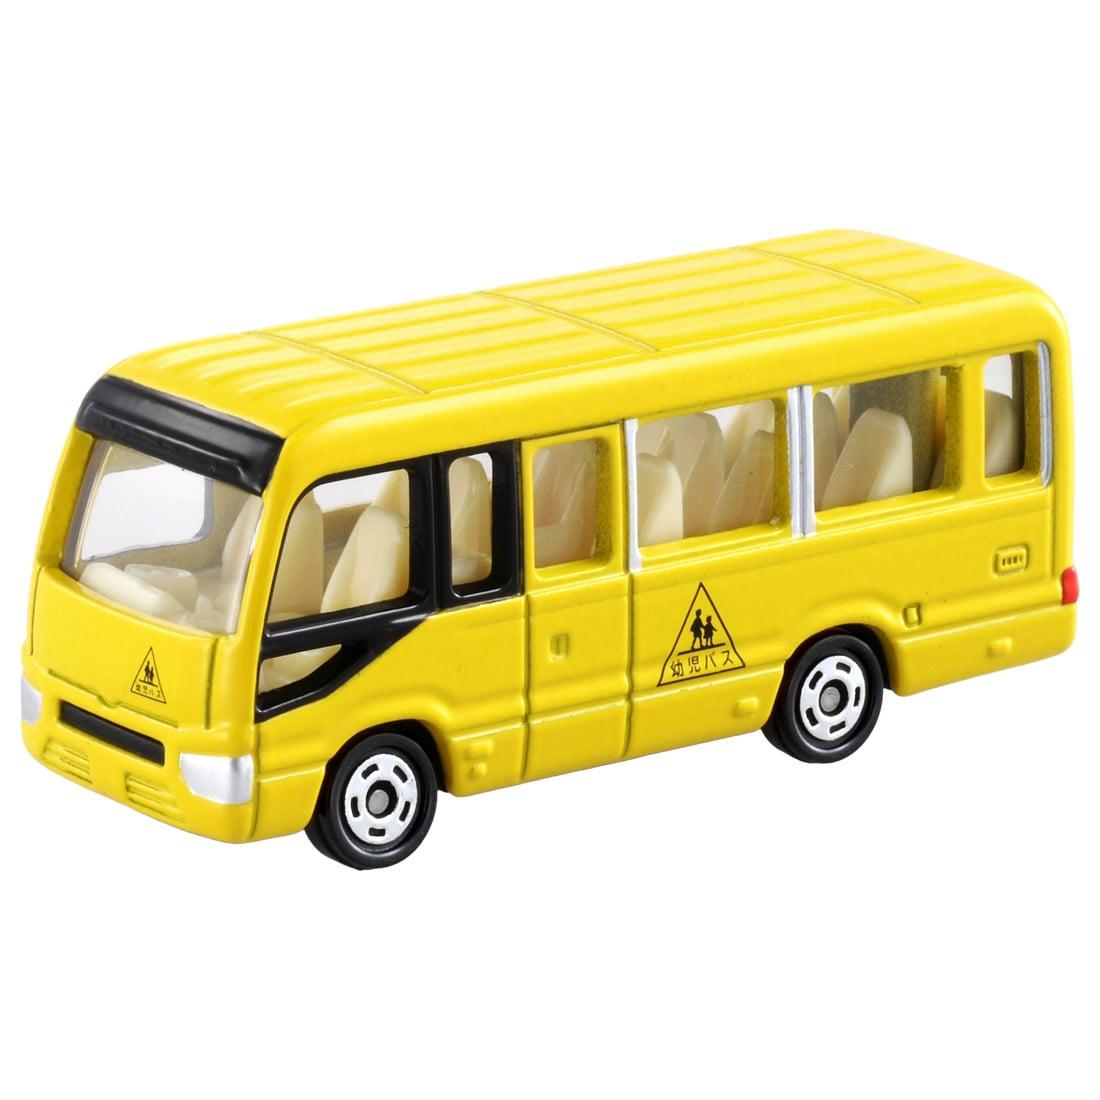 TOMICA 多美小汽車#49 豐田COASTER幼兒園巴士 【新車貼】